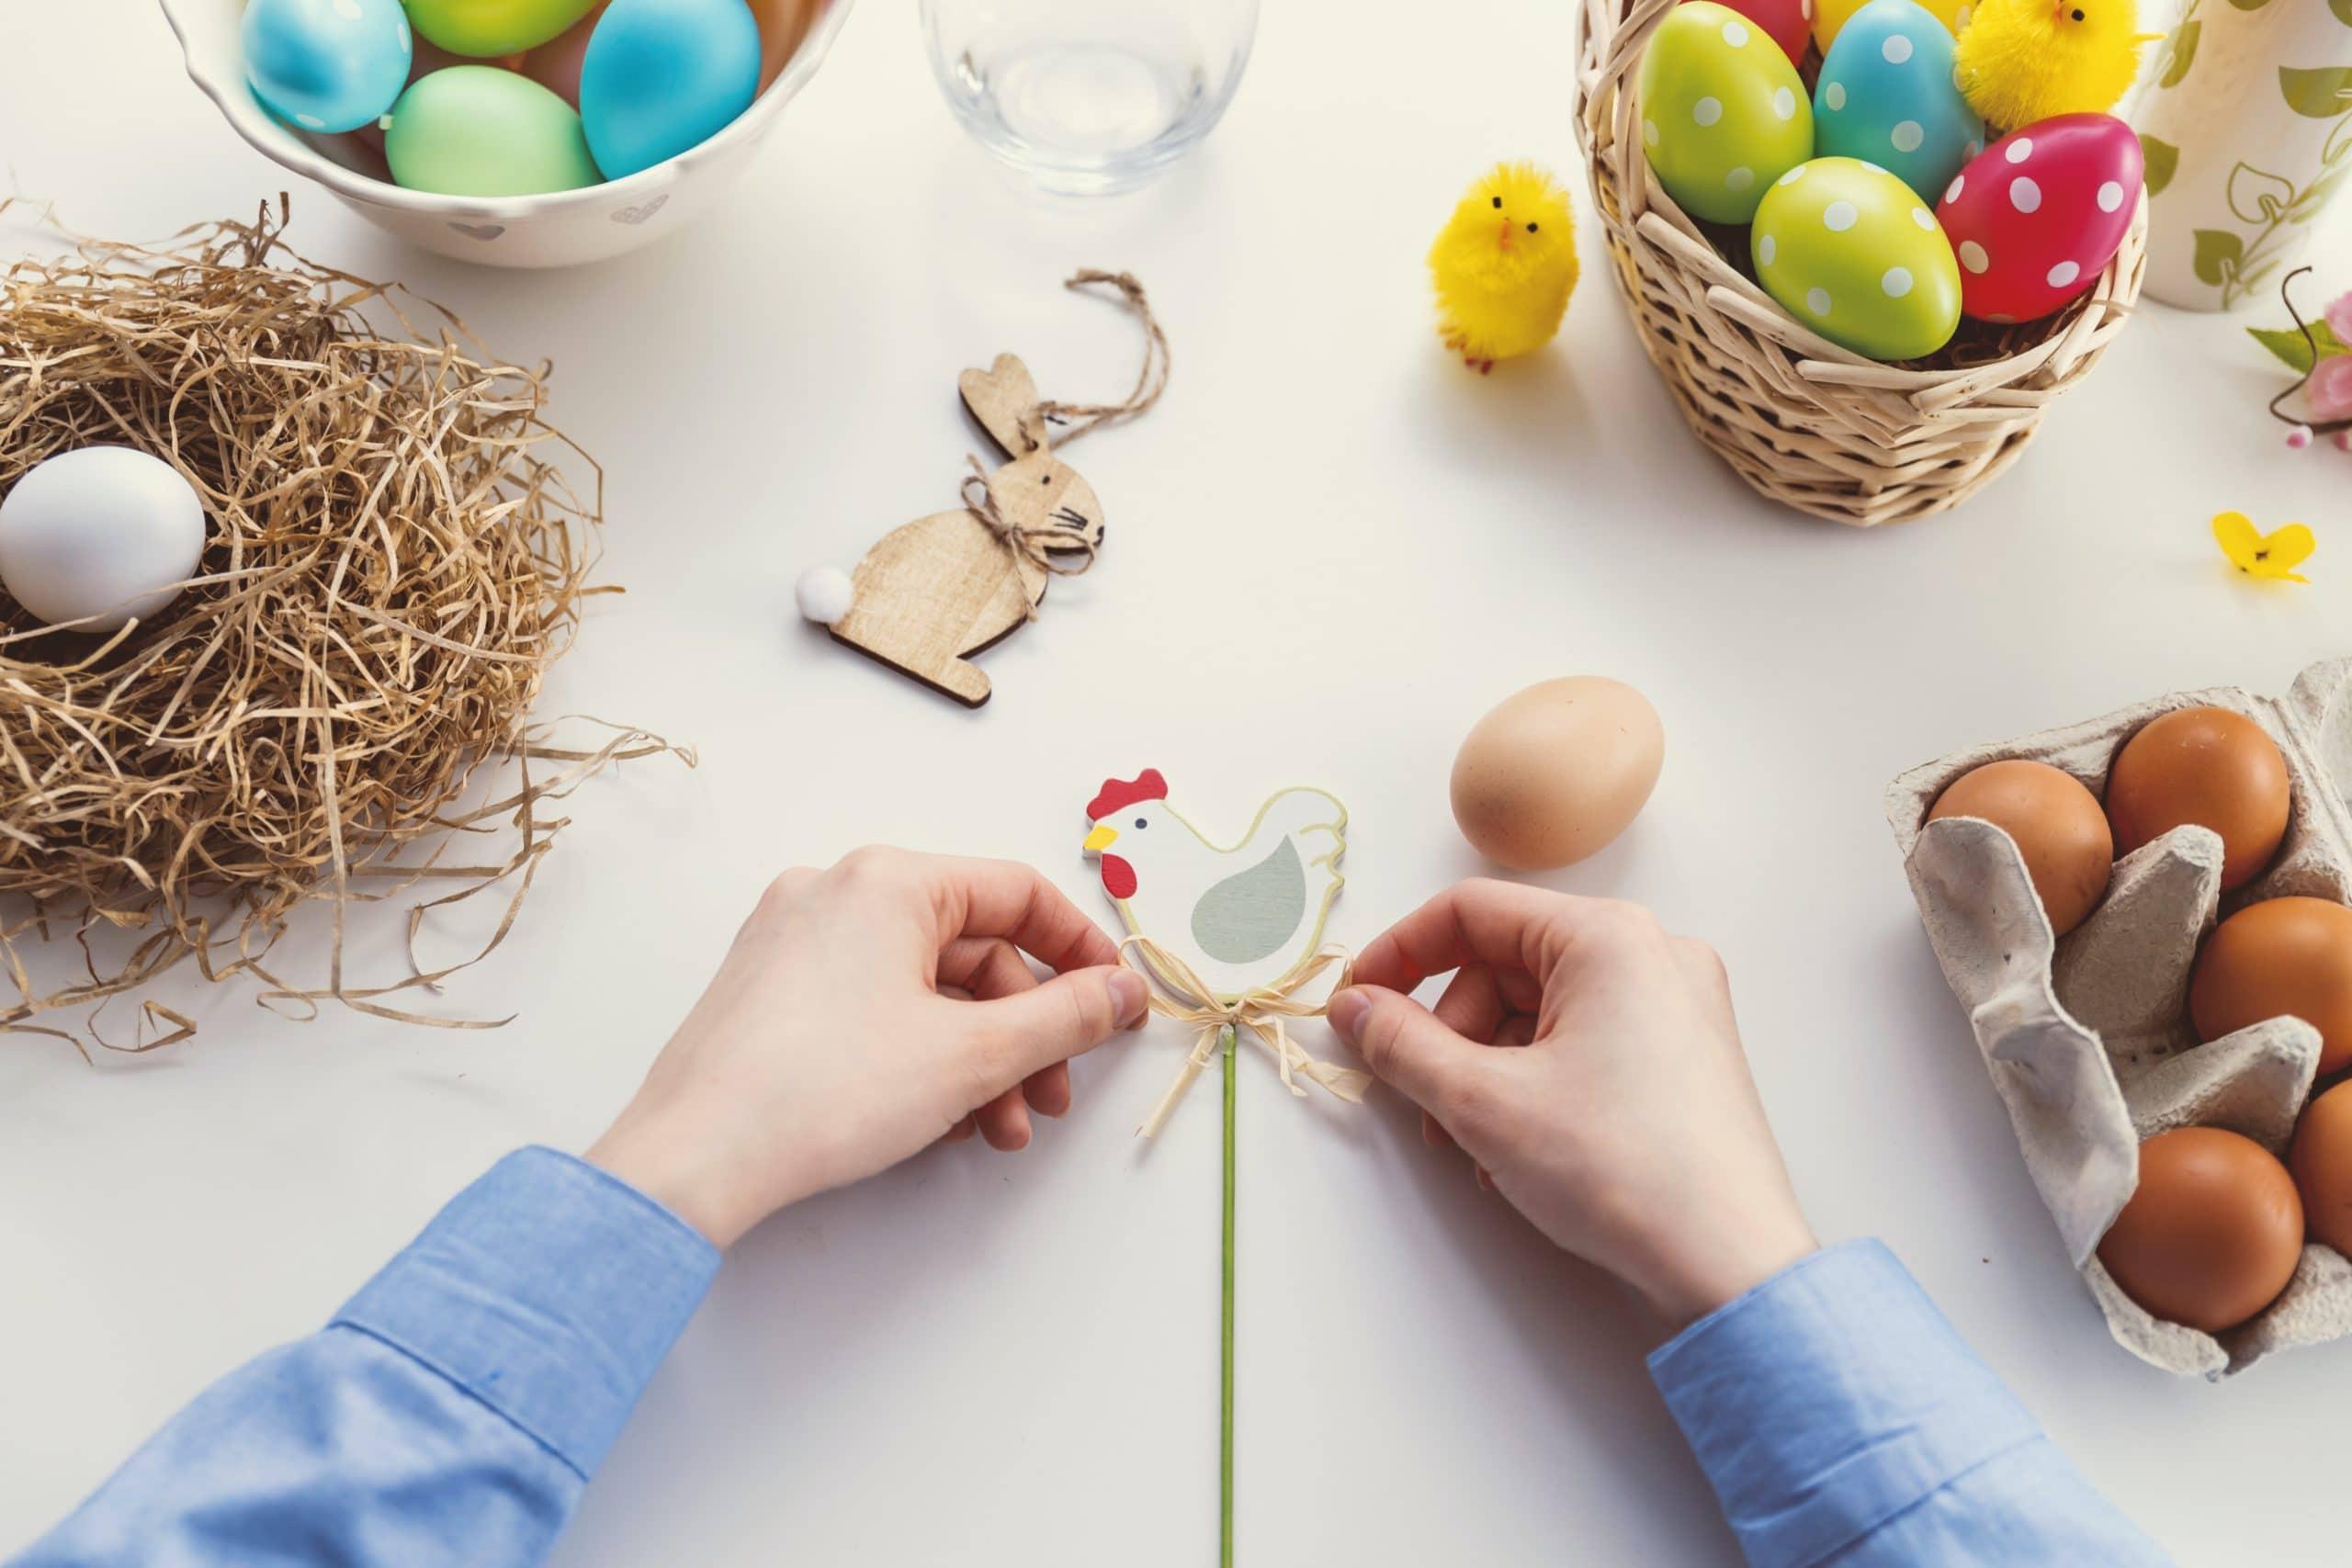 Easter gift for grandma and grandpa